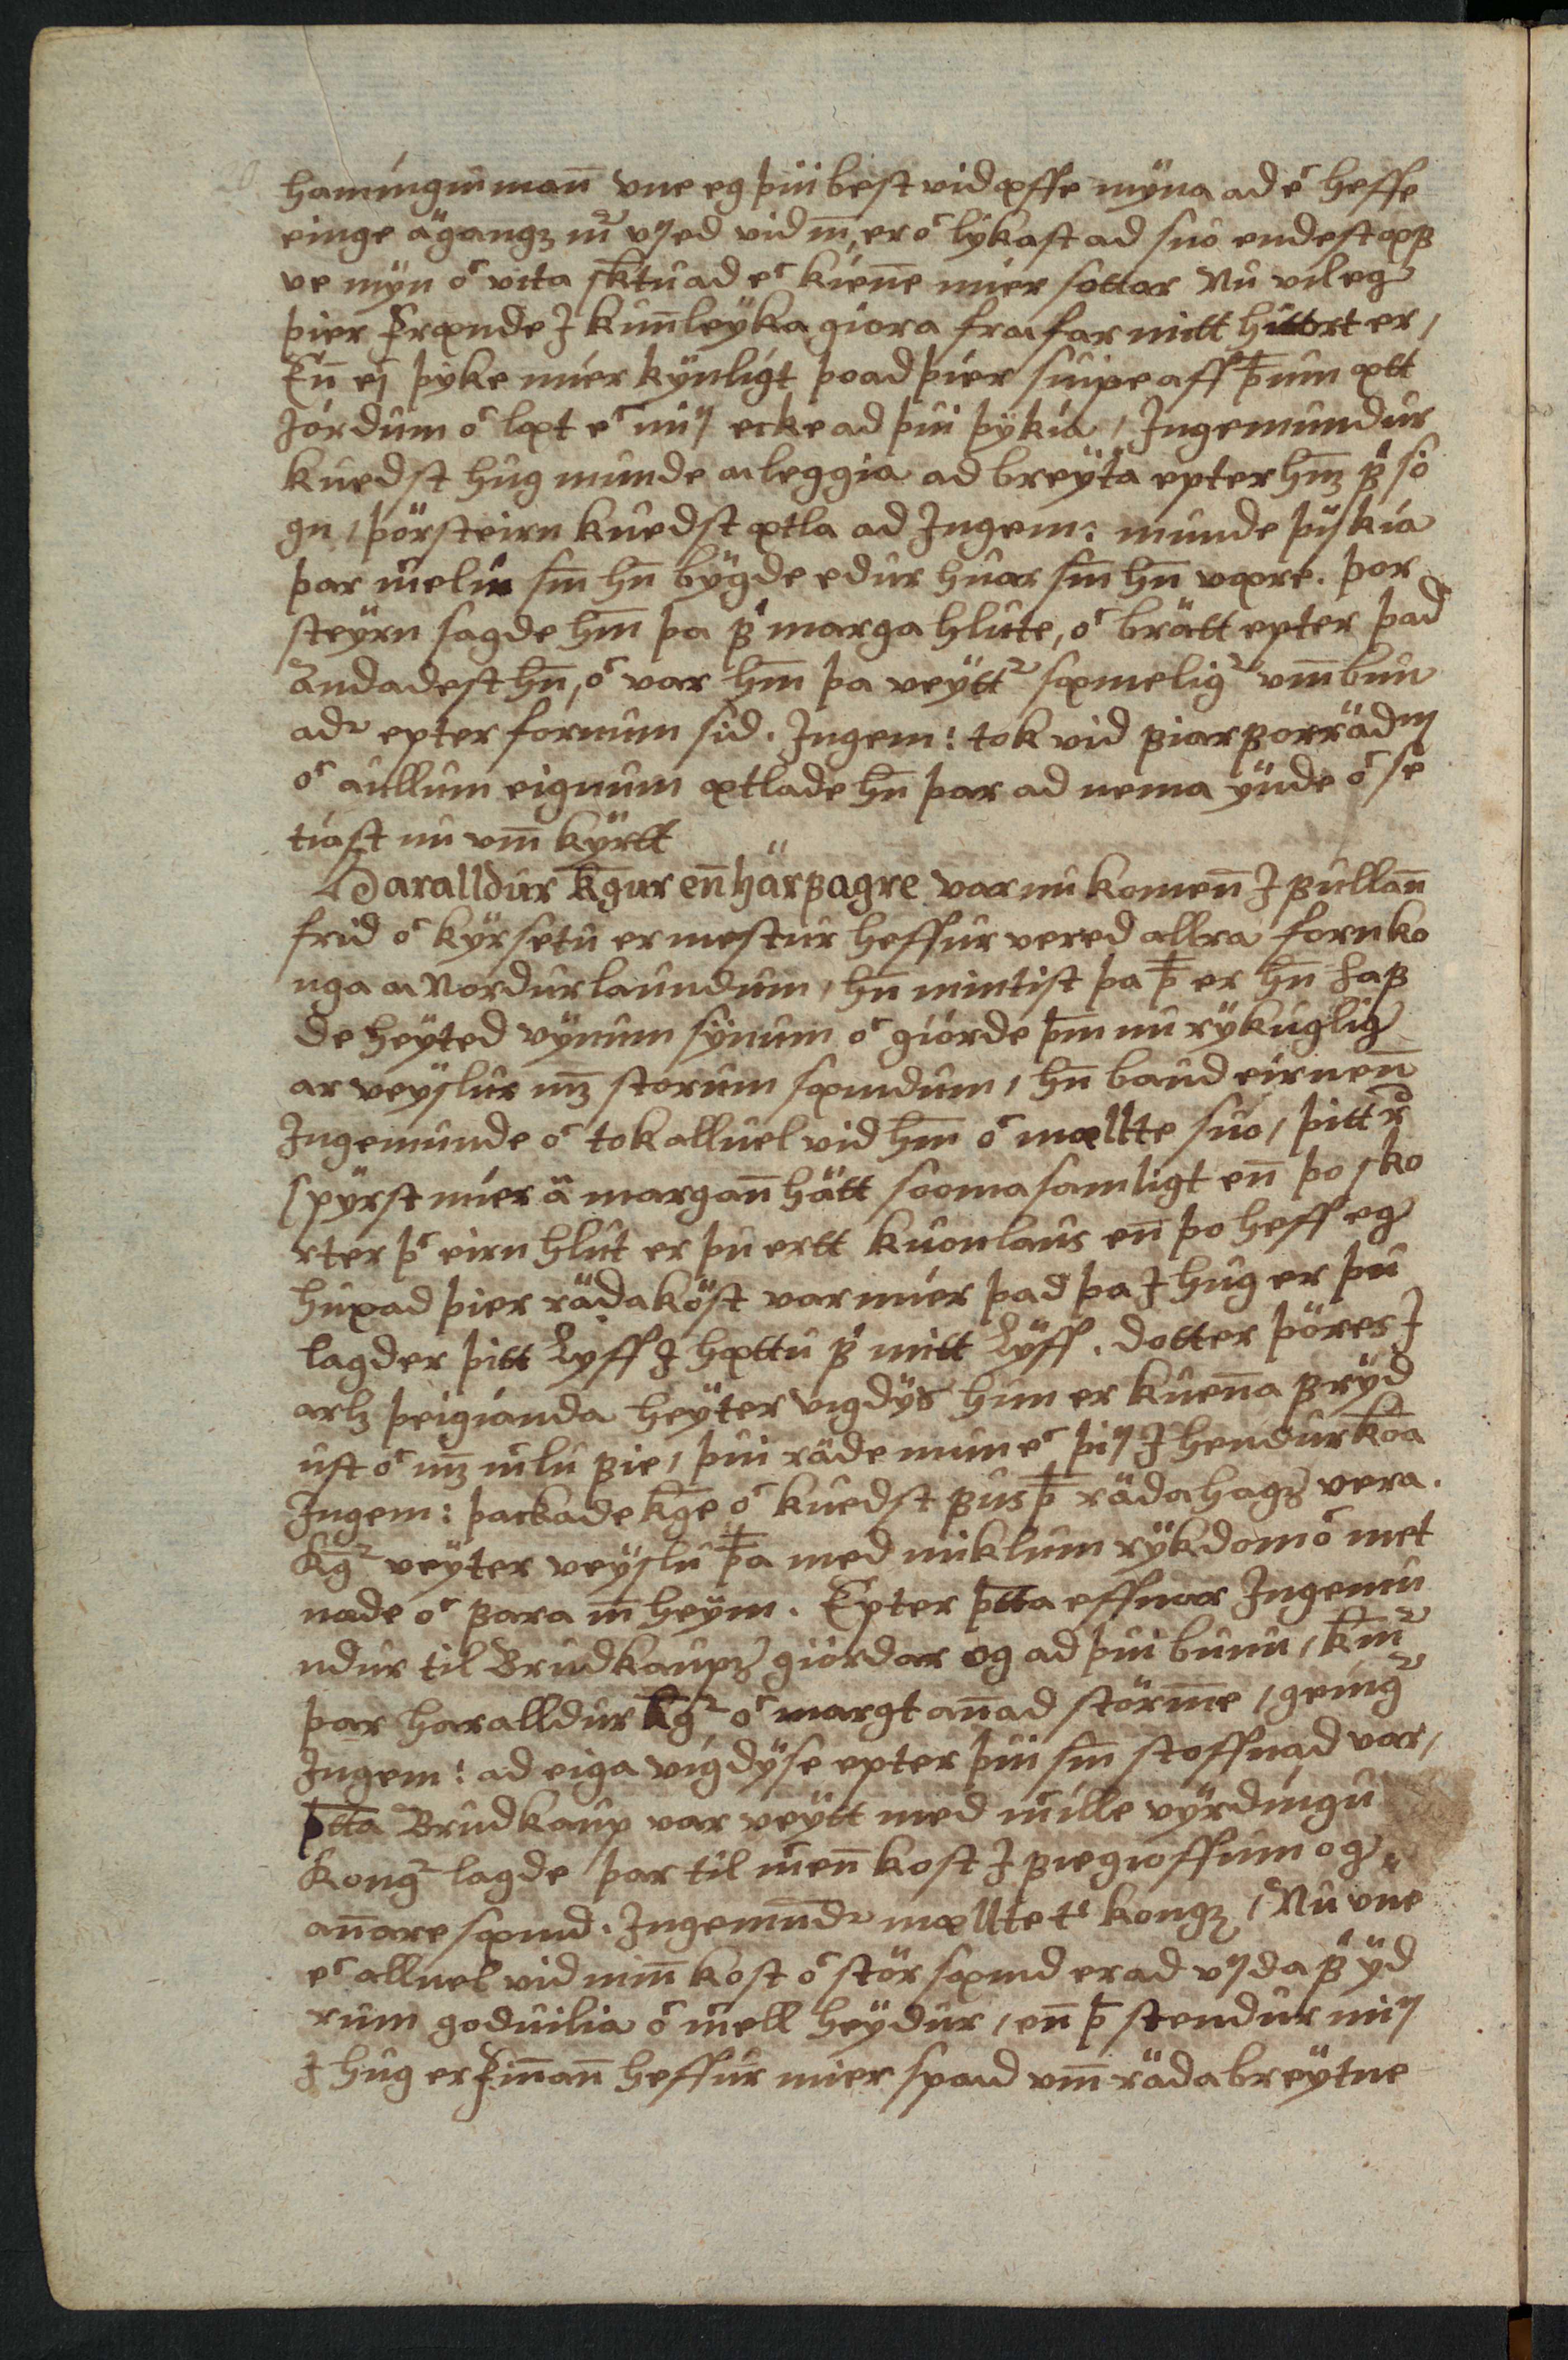 AM 138 fol - 10v